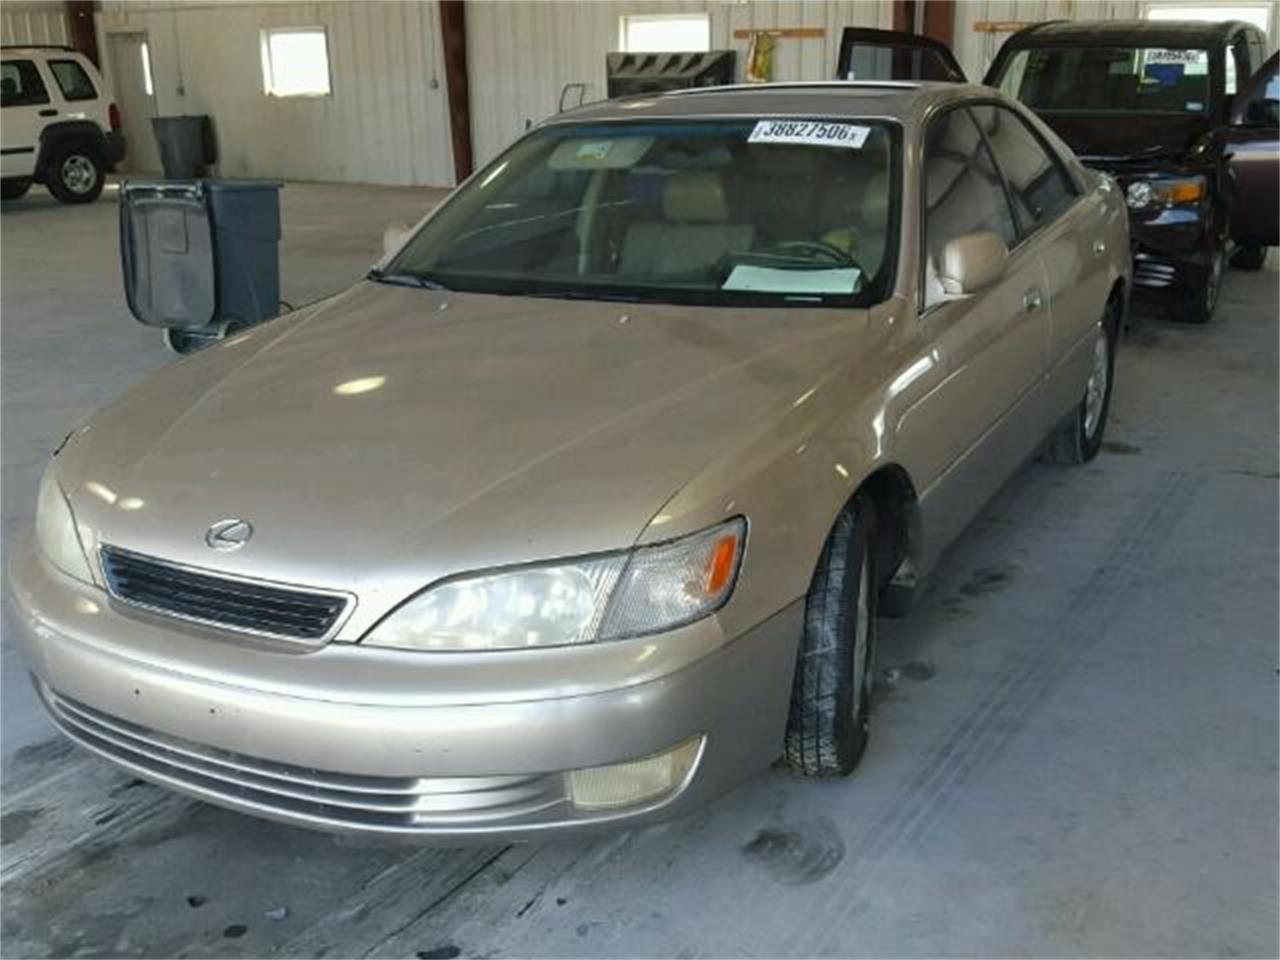 1997 Lexus ES300 for Sale | ClassicCars com | CC-943457